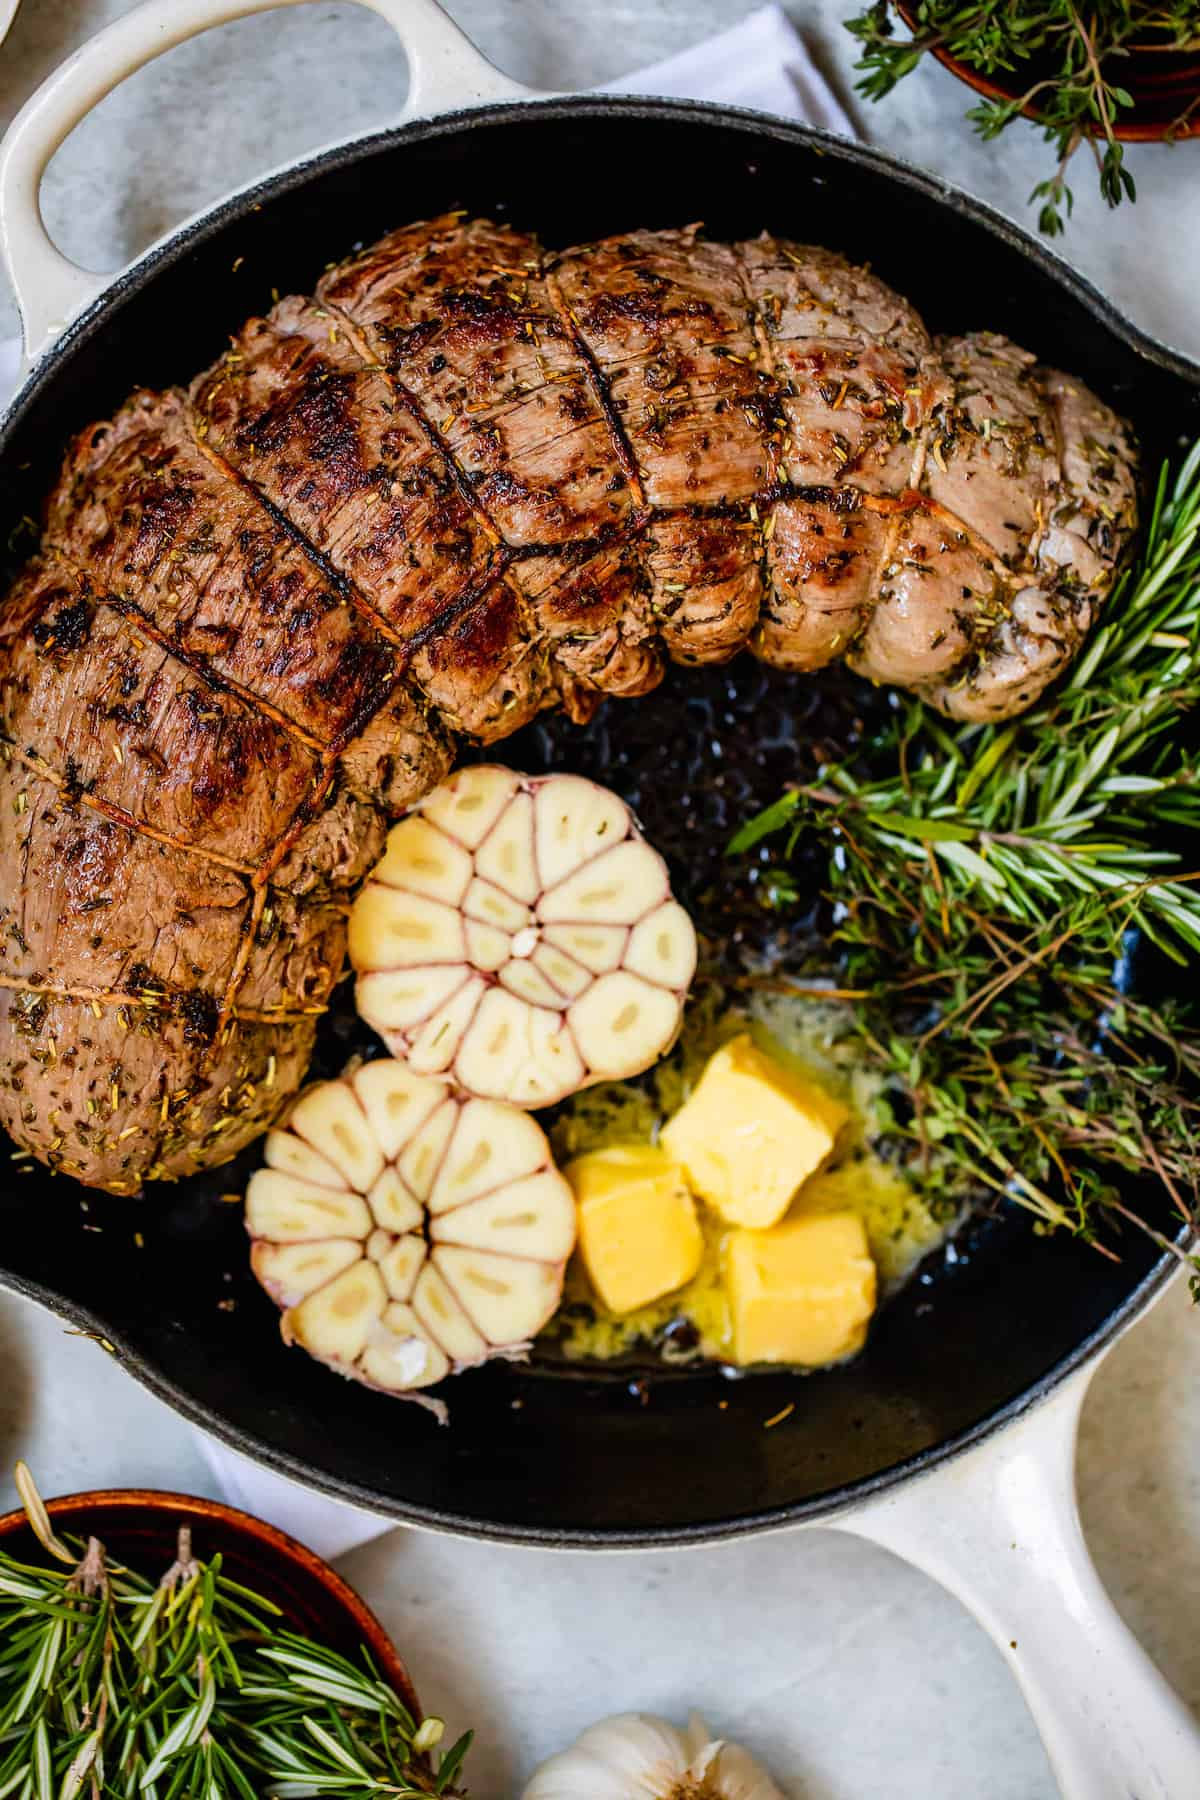 Roast Tenderloin, Garlic Cloves, Rosemary and Butter in a Metal Skillet